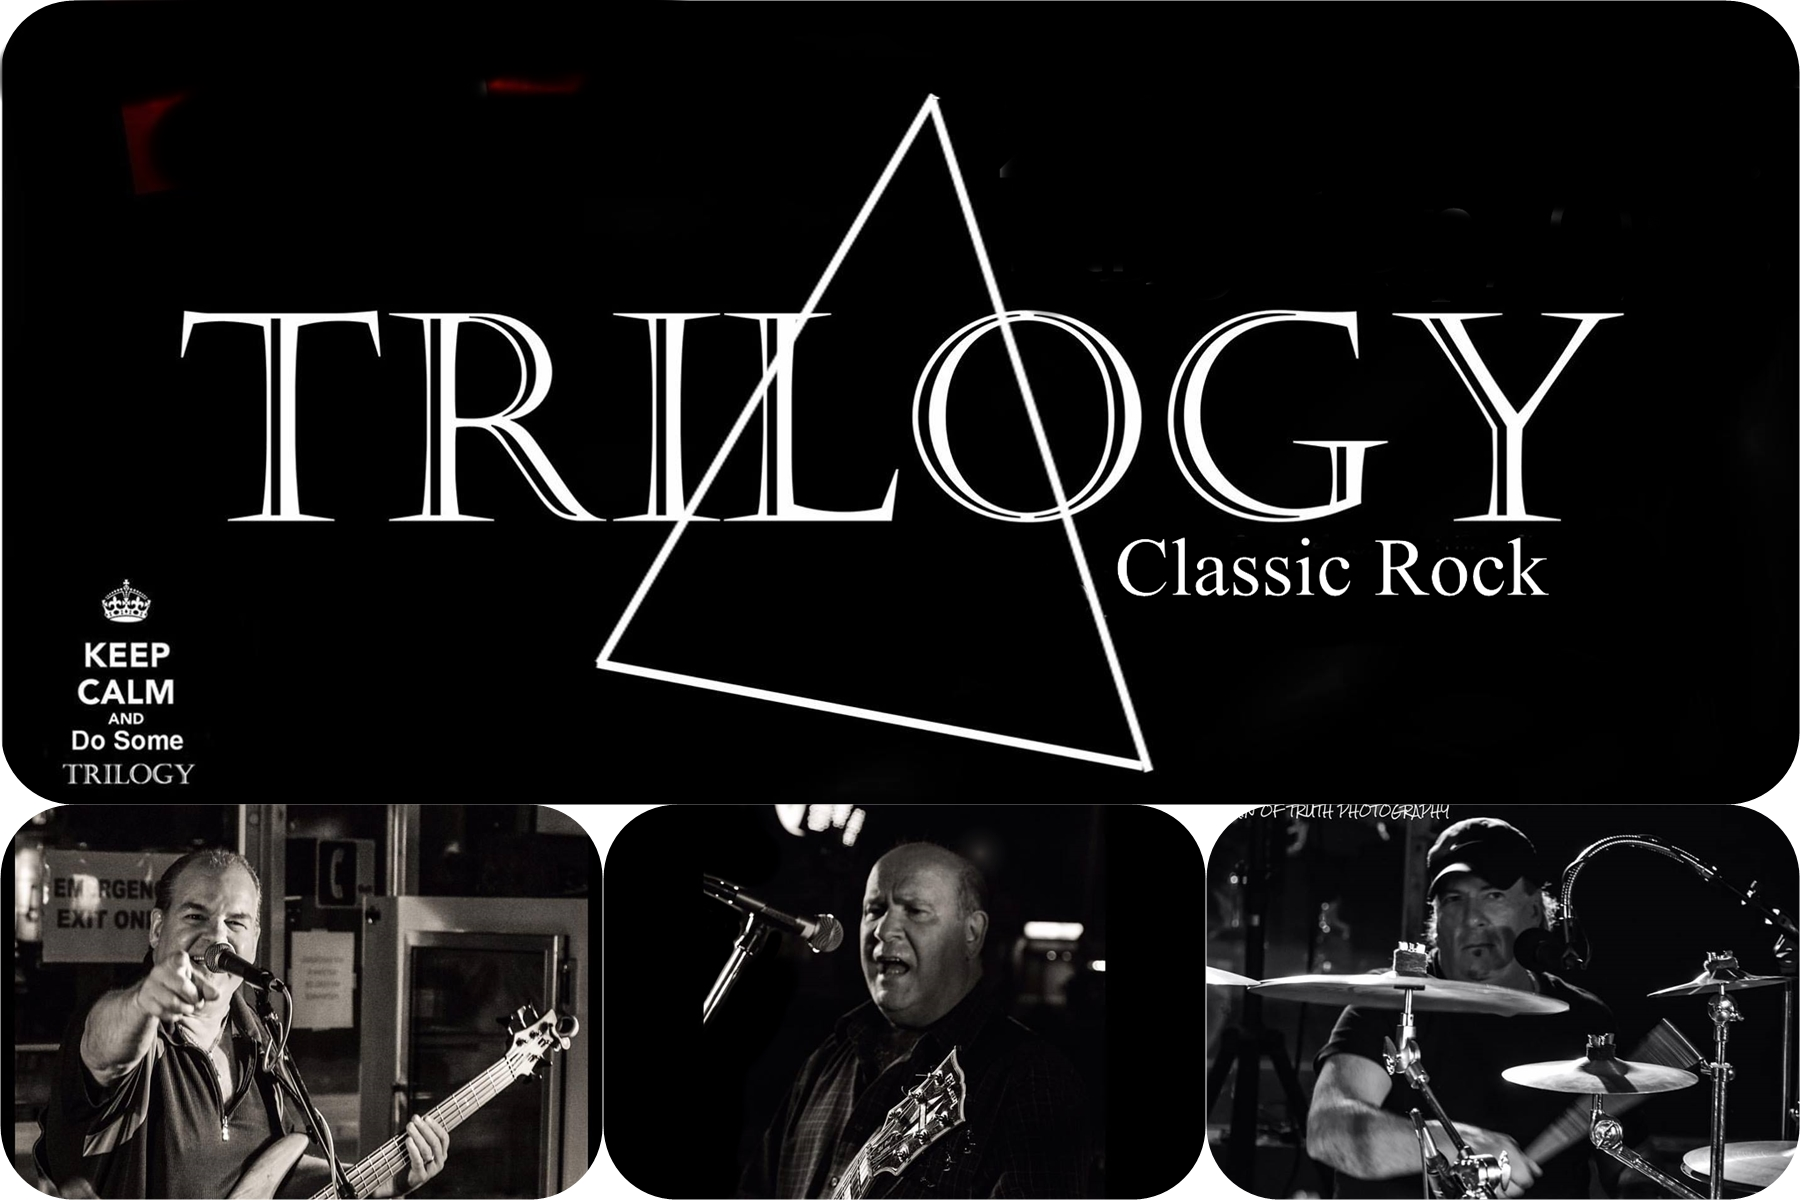 Trilogy Saturday June 29, 2019 2pm-6pm